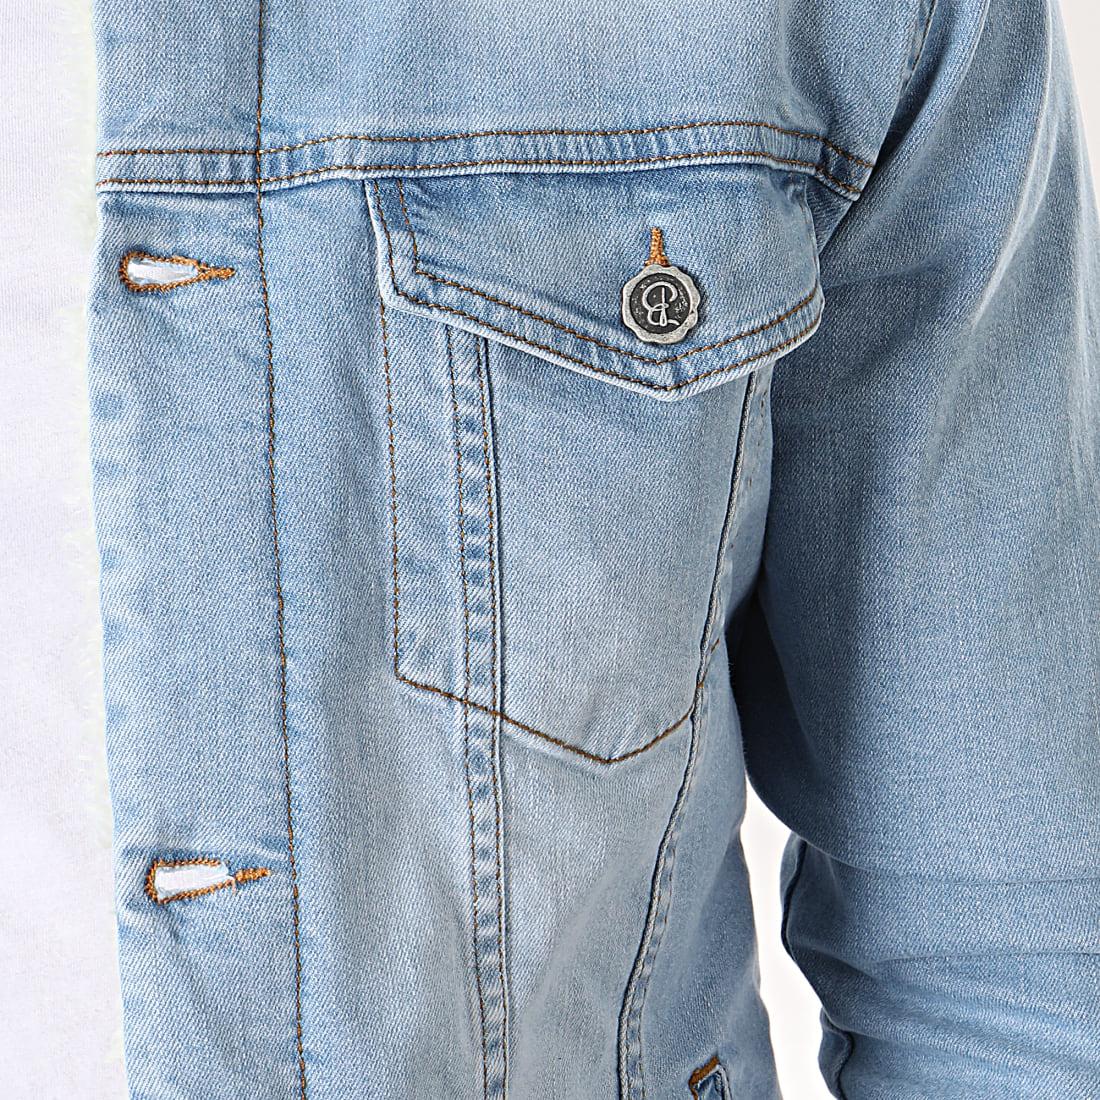 Black Needle Veste En Jean A Col Mouton 5000 Bleu Wash